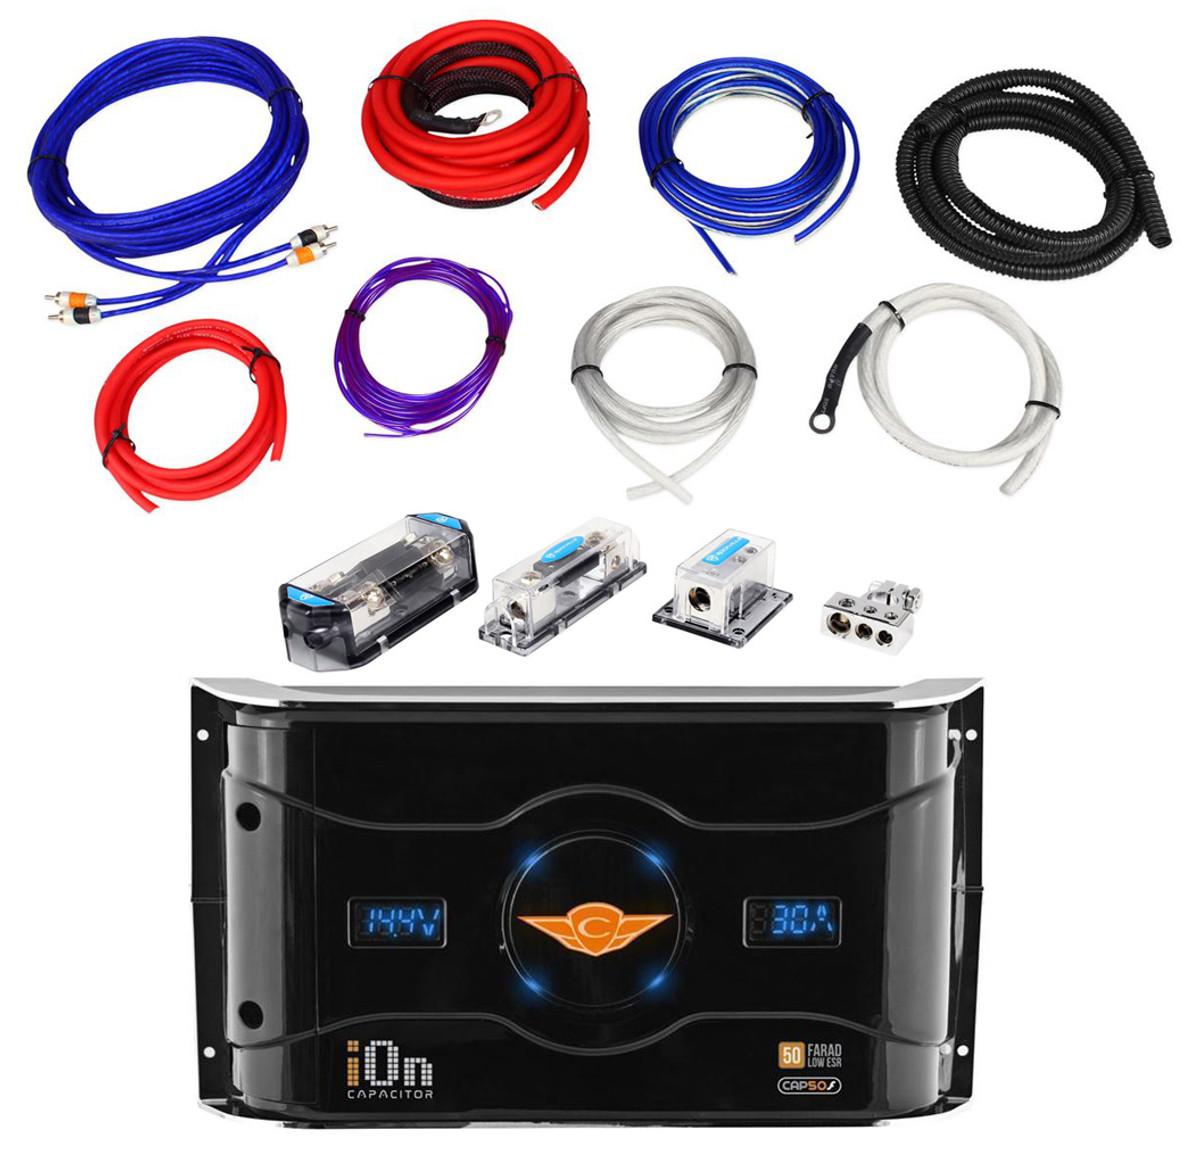 medium resolution of rockville rda0 4k 0 4 gauge dual amp install kit cap50f 50 farad dual amp wiring kit with capacitor